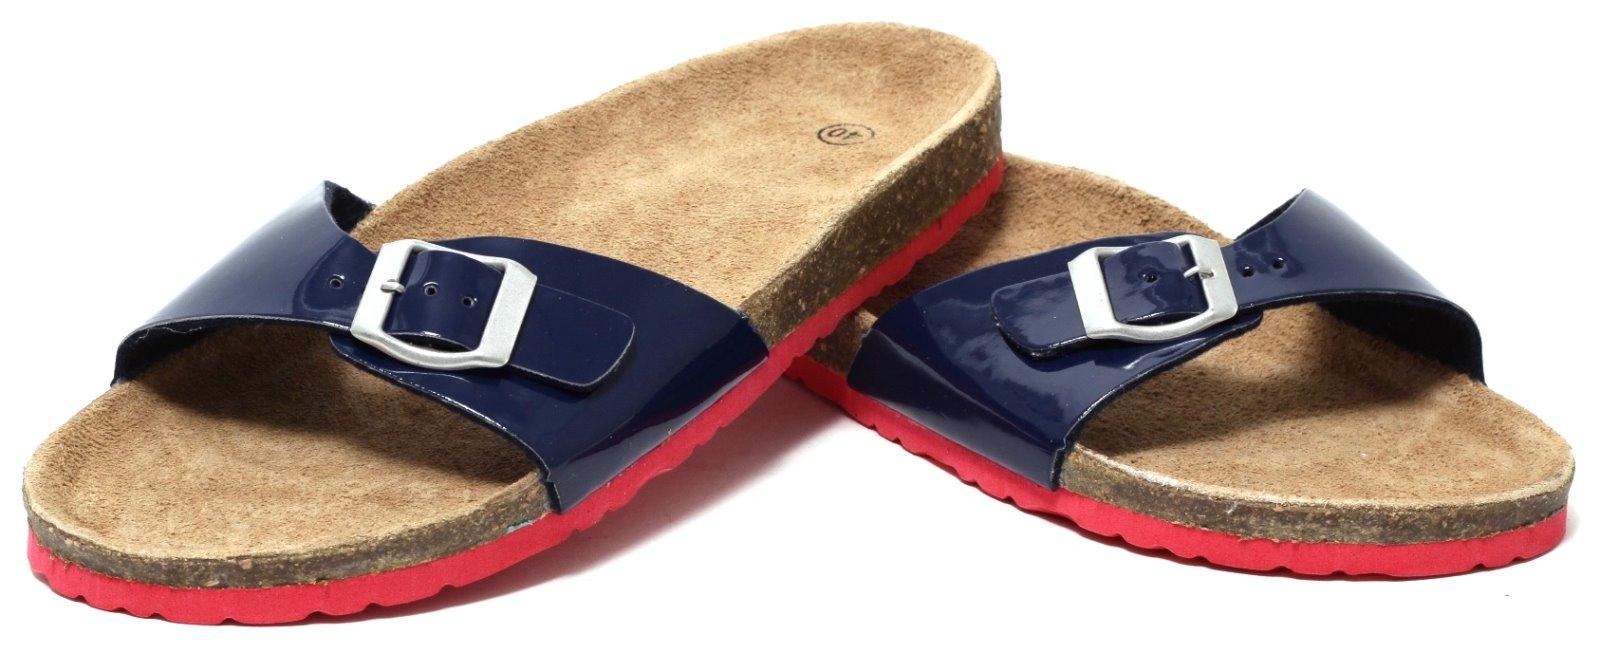 Damen Bio Trend Pantolette Gr 37-41 blau Sandale Sandalette Pantoffel Lack Optik yzdDe